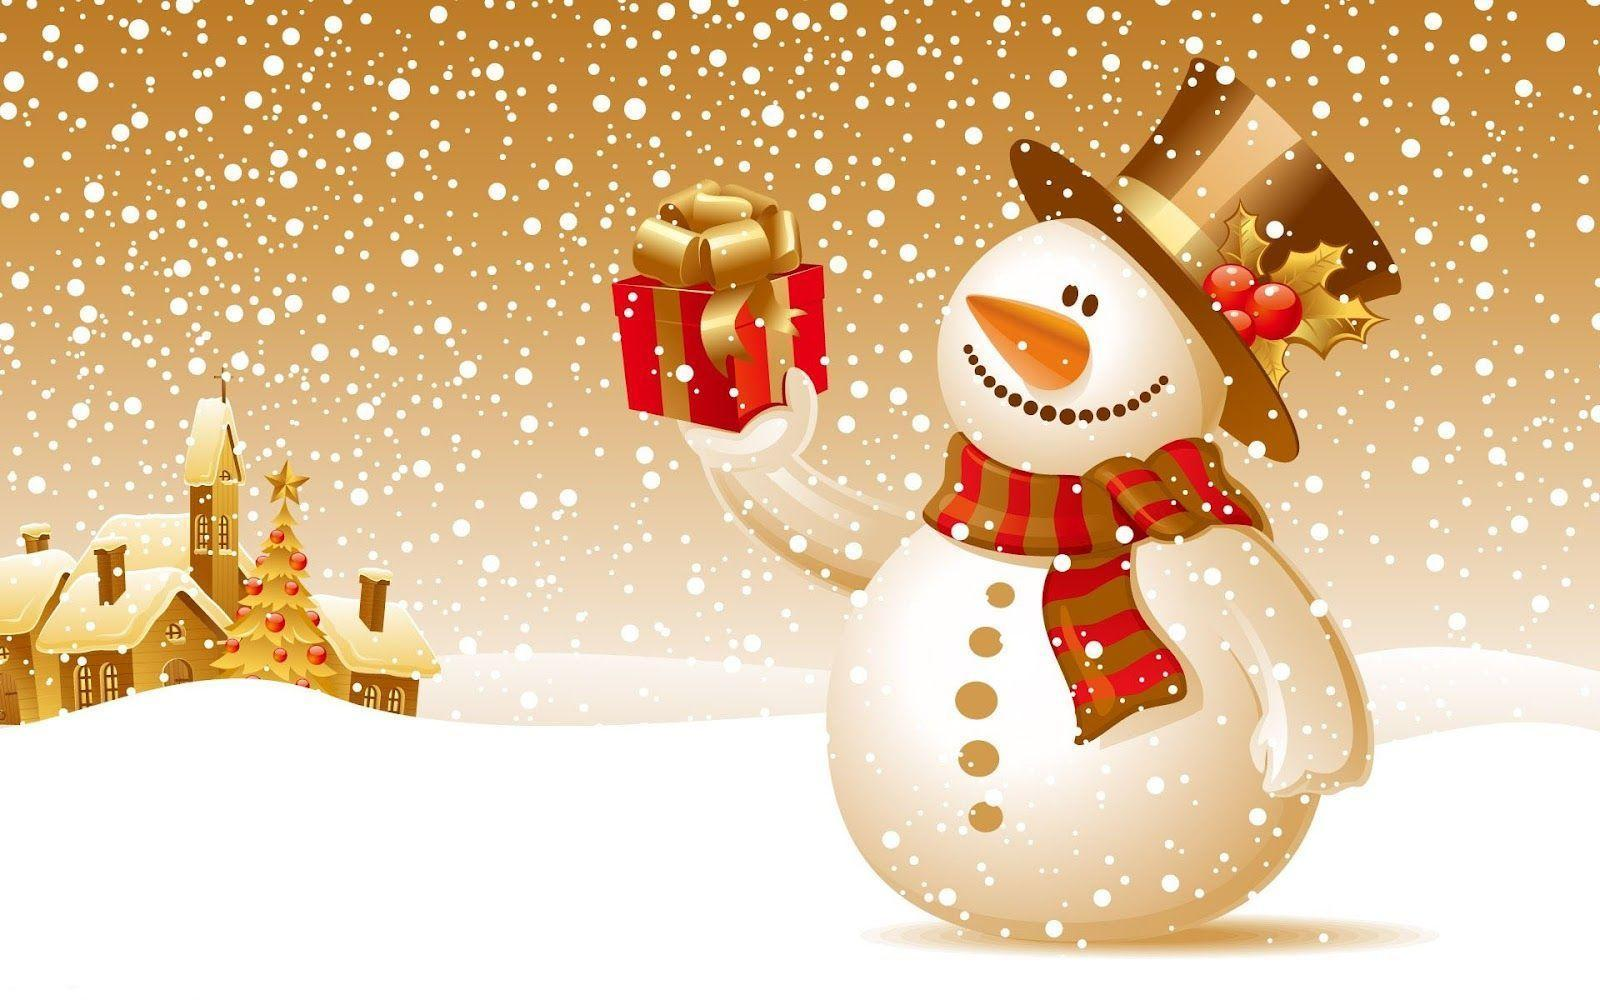 Christmas snowman wallpapers wallpaper cave